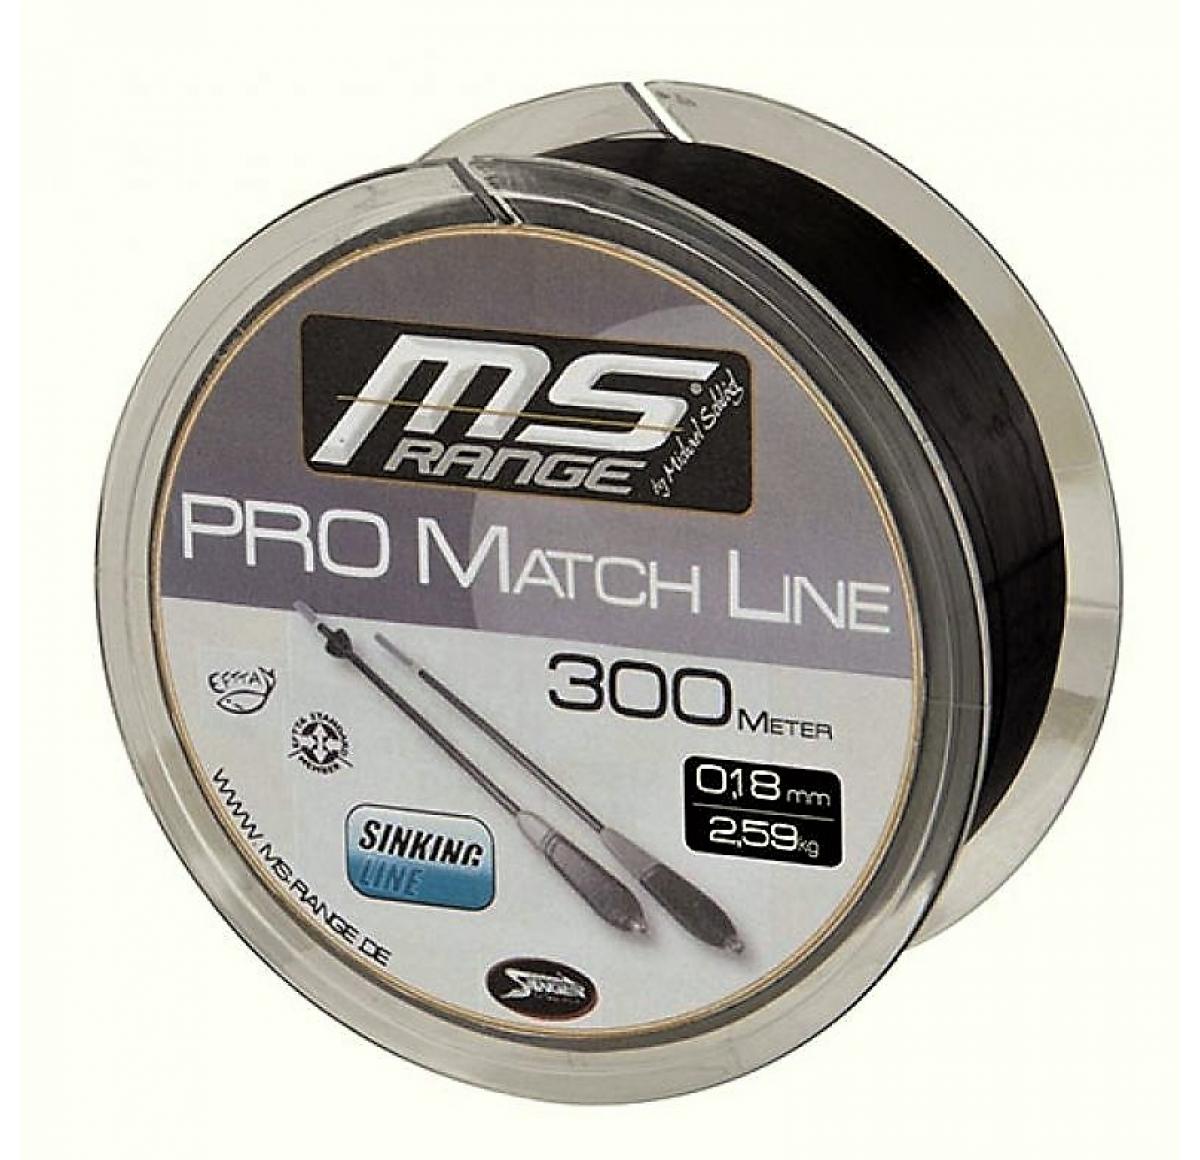 MS RANGE Pro Match Line 0.18mm 300m